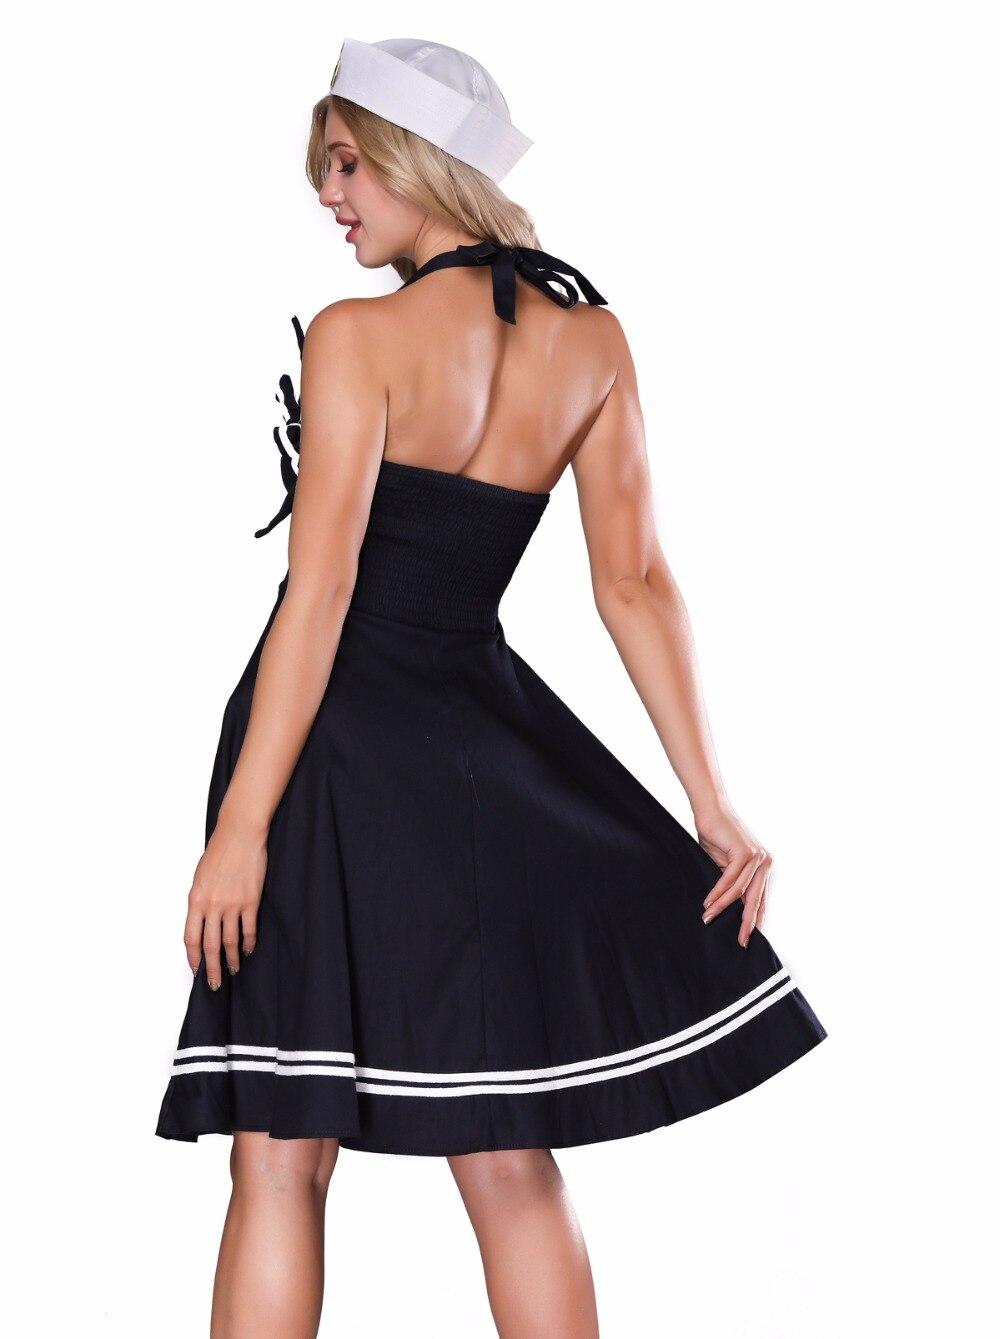 White Retro Vintage Pin Up Sailor Skirt Set Adult Costume